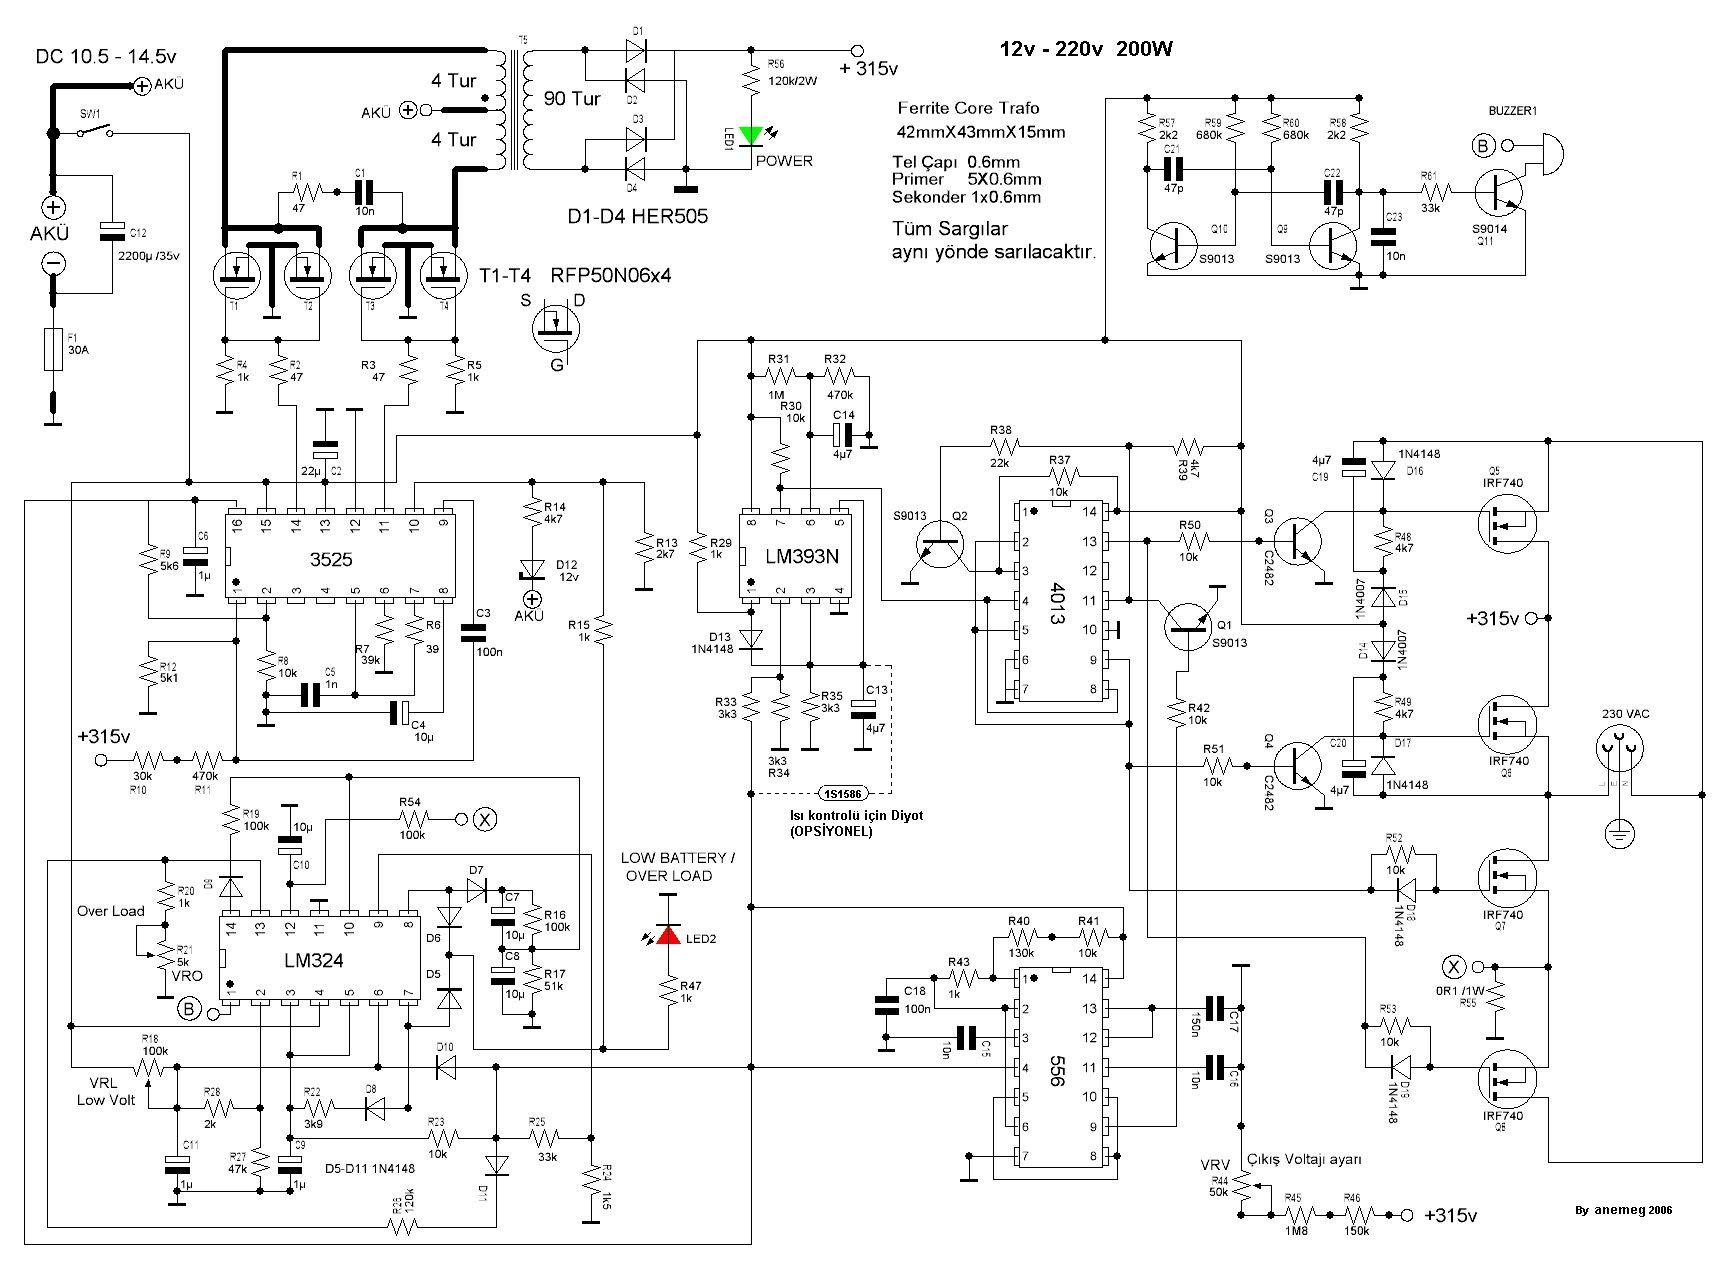 1kva Inverter Circuit Diagram Manual Luxury Ponent Sine Wave Inverter Circuit Diagram Make This 1k Circuit Diagram Circuit Projects Electronic Circuit Projects